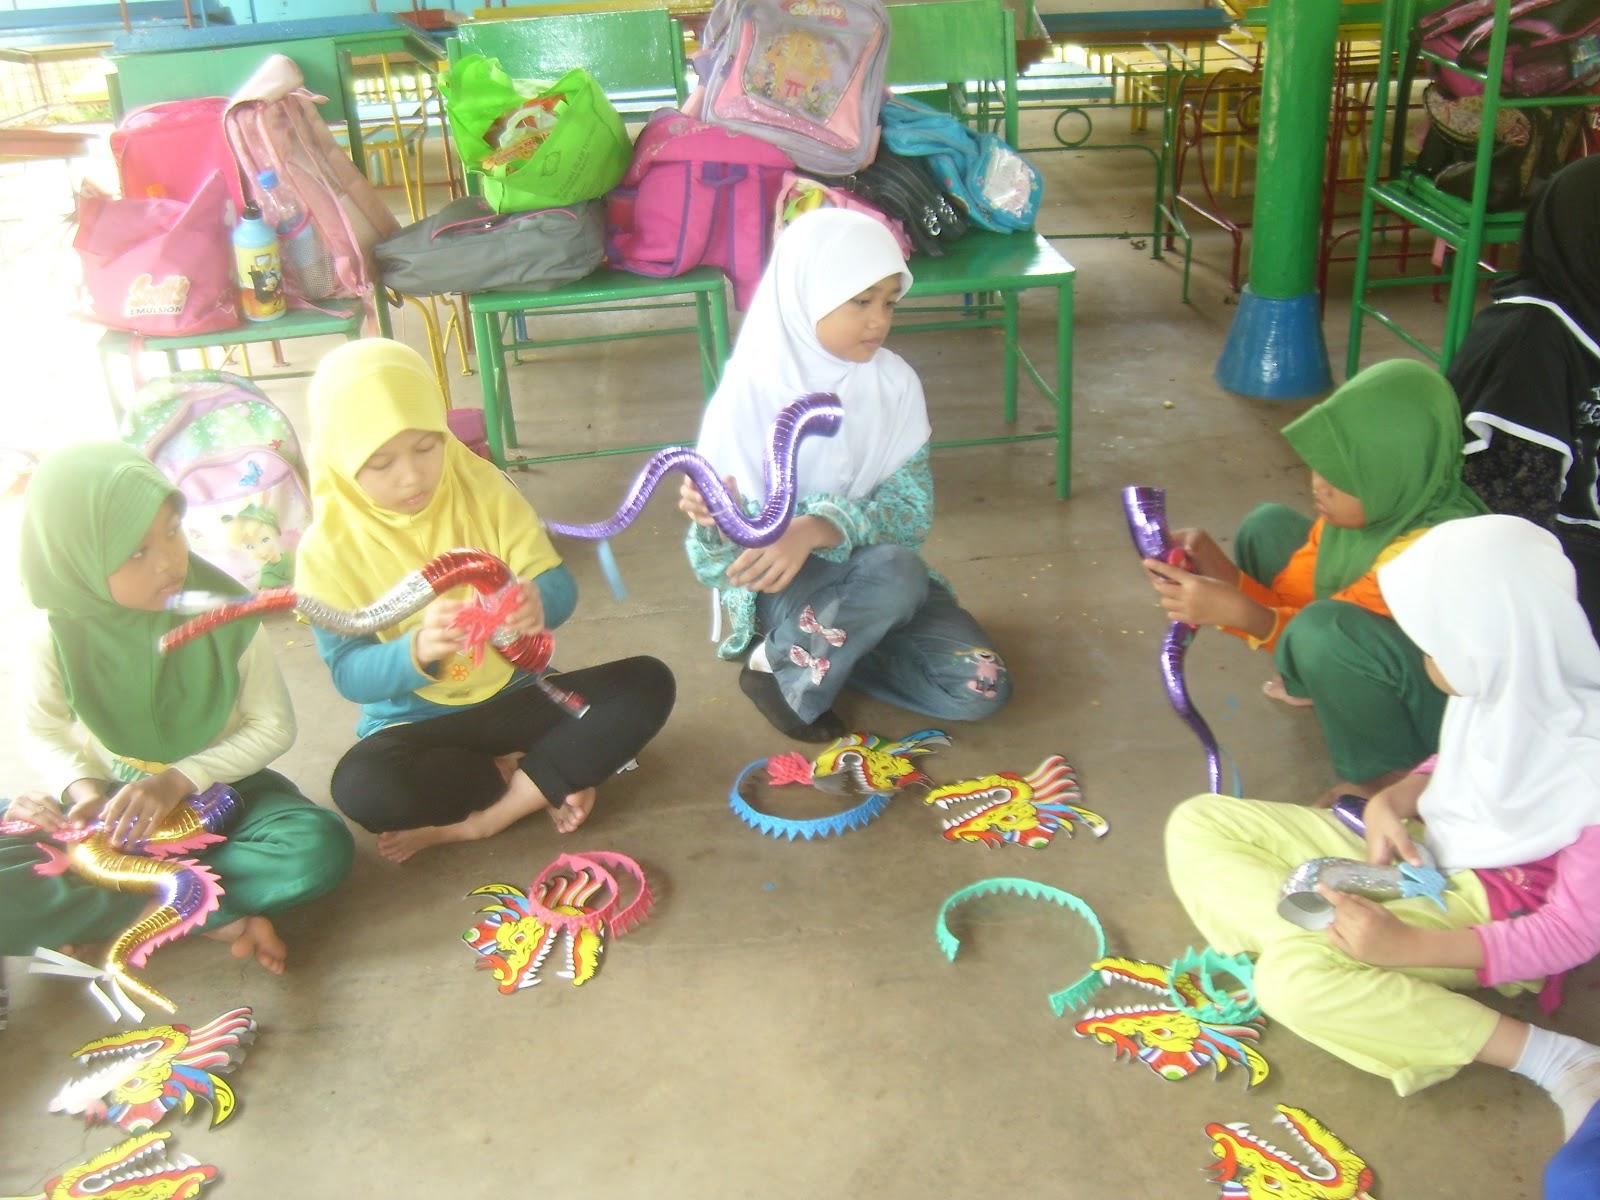 M Tambun Sd Al Musli Terompet Mainan 4 Potong Ujung Sedotan Yang Telah Di Tekanmasukkan Dalam Lubang Kecil Pada Corongcobalah Tersebut 5 Letakkan Mulut Dan Tiuplahrasakan